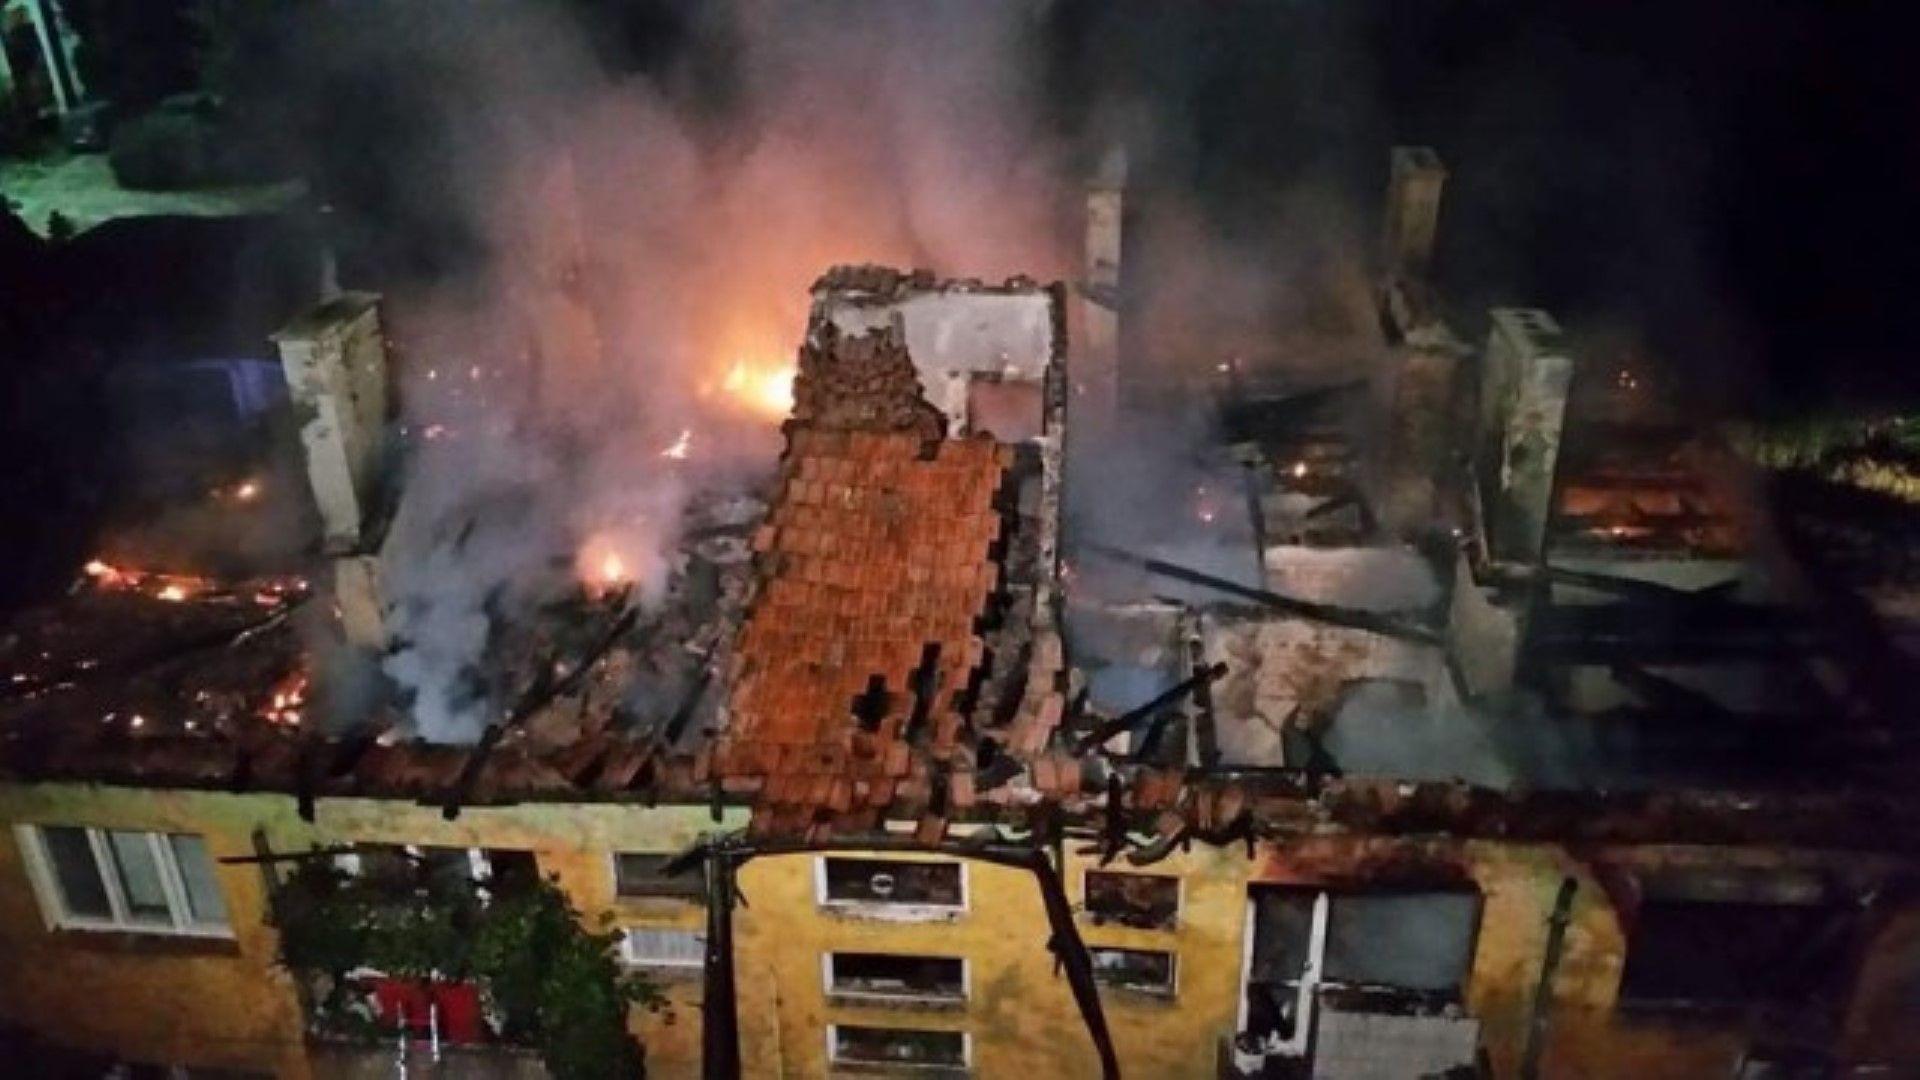 Пожар изпепели жилищна сграда, остави семейства без дом (снимки)